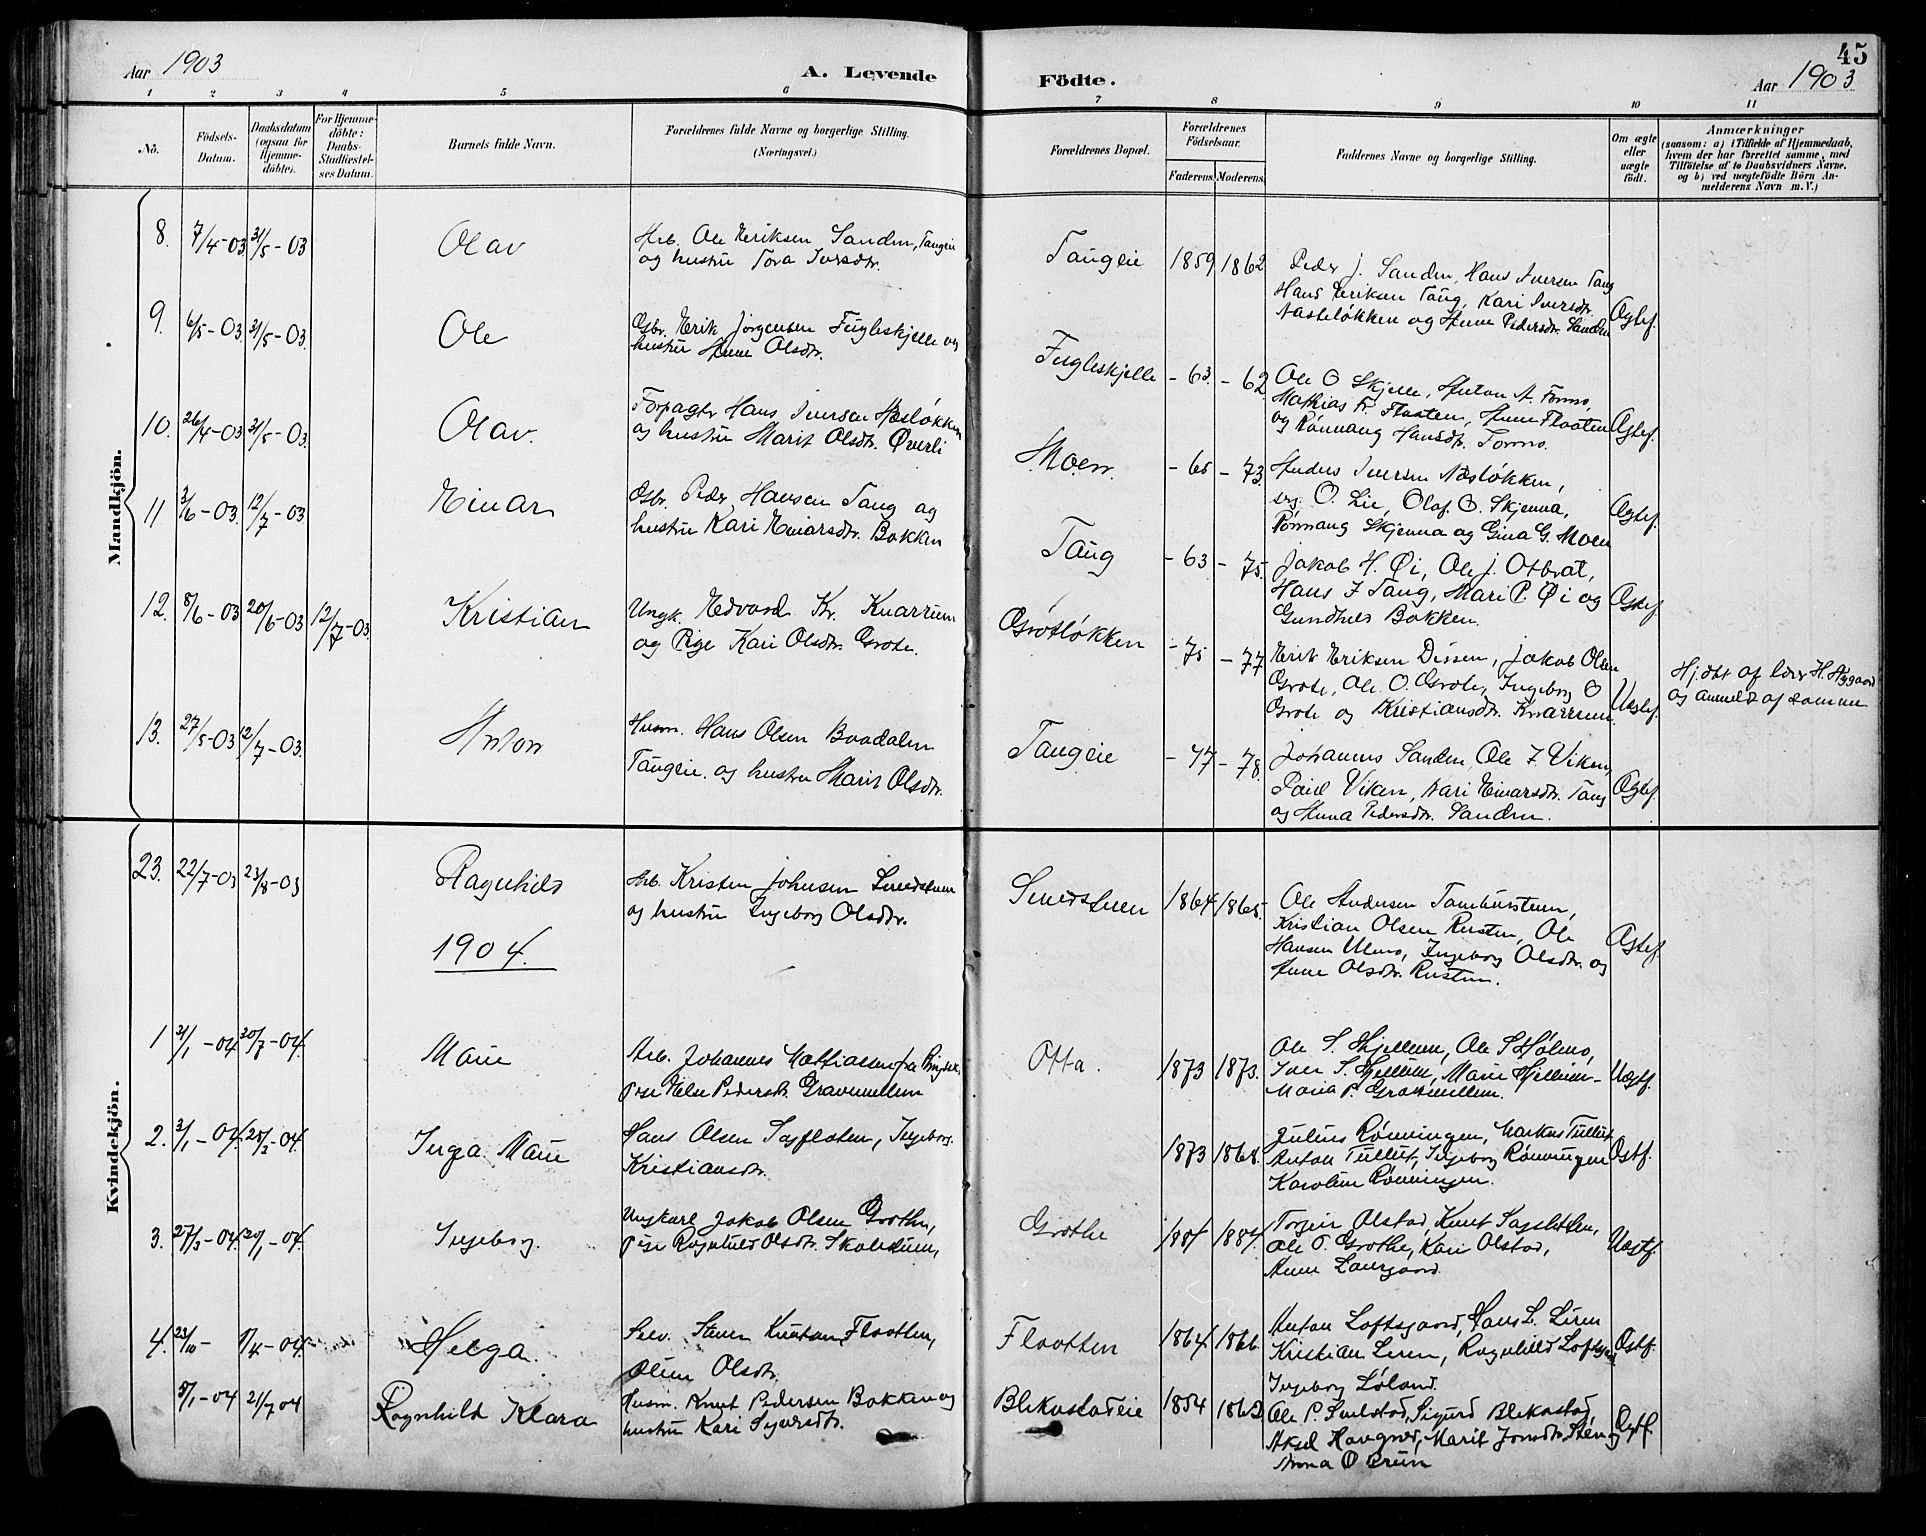 SAH, Sel prestekontor, Klokkerbok nr. 1, 1894-1923, s. 45